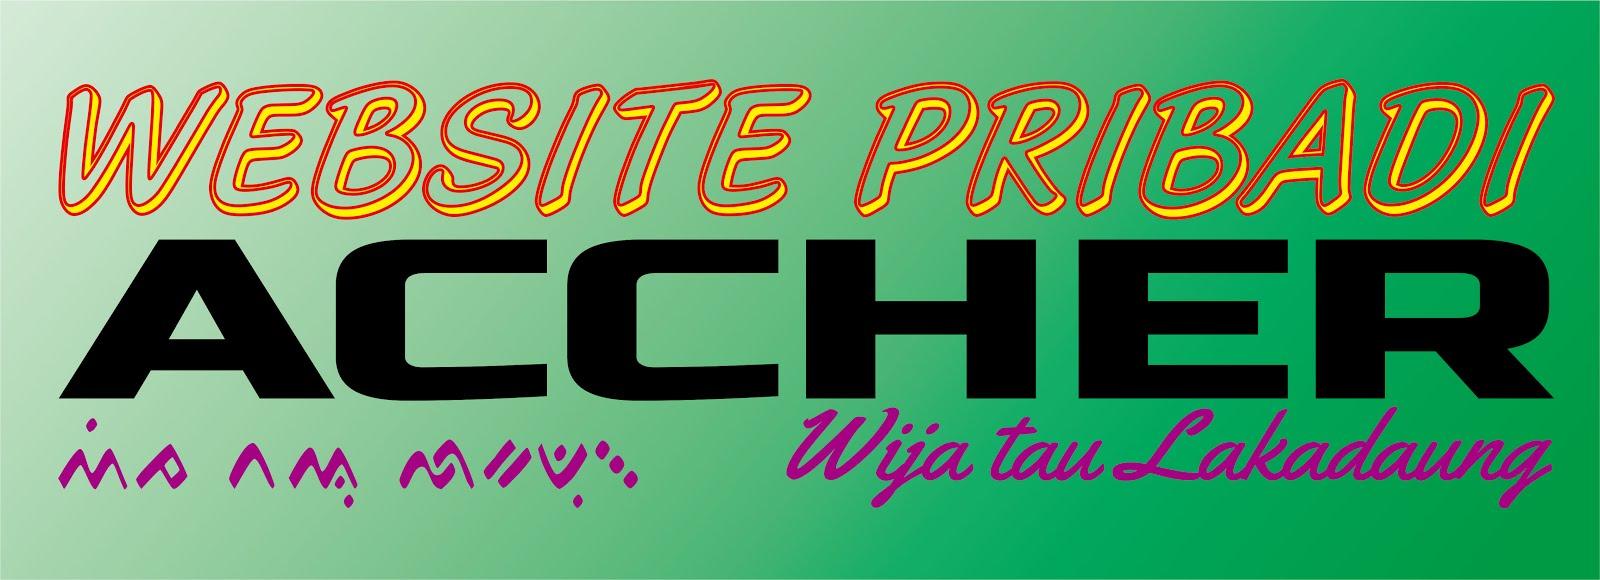 Website Pribadi Accher